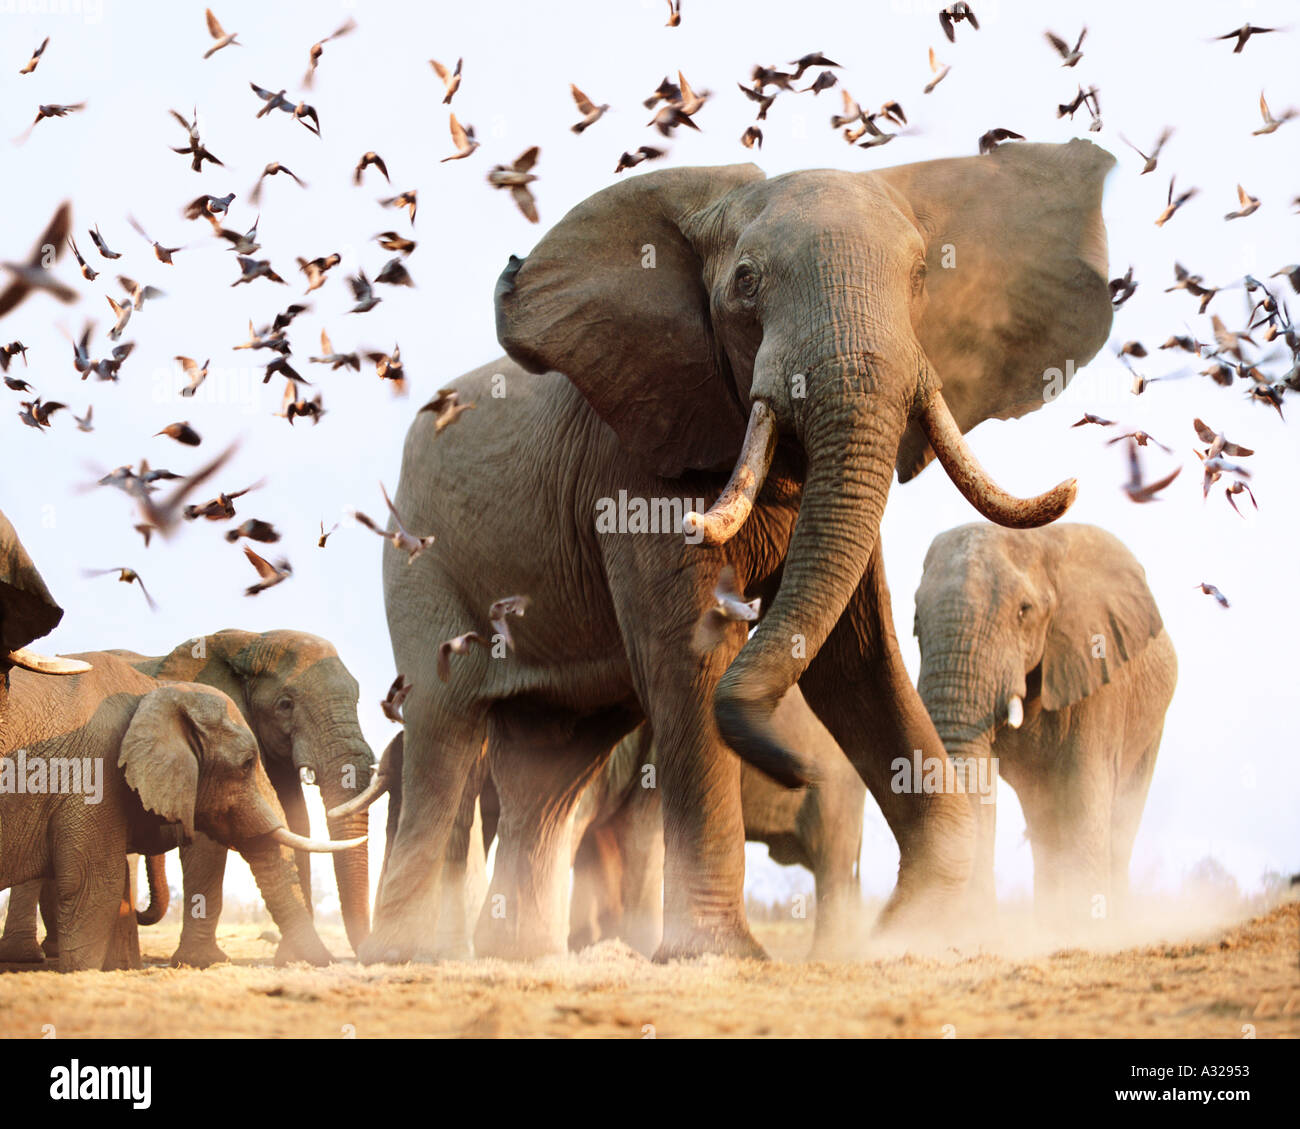 Afrikanische Elefanten stören Vogelschwarm Savuti Botswana Stockfoto